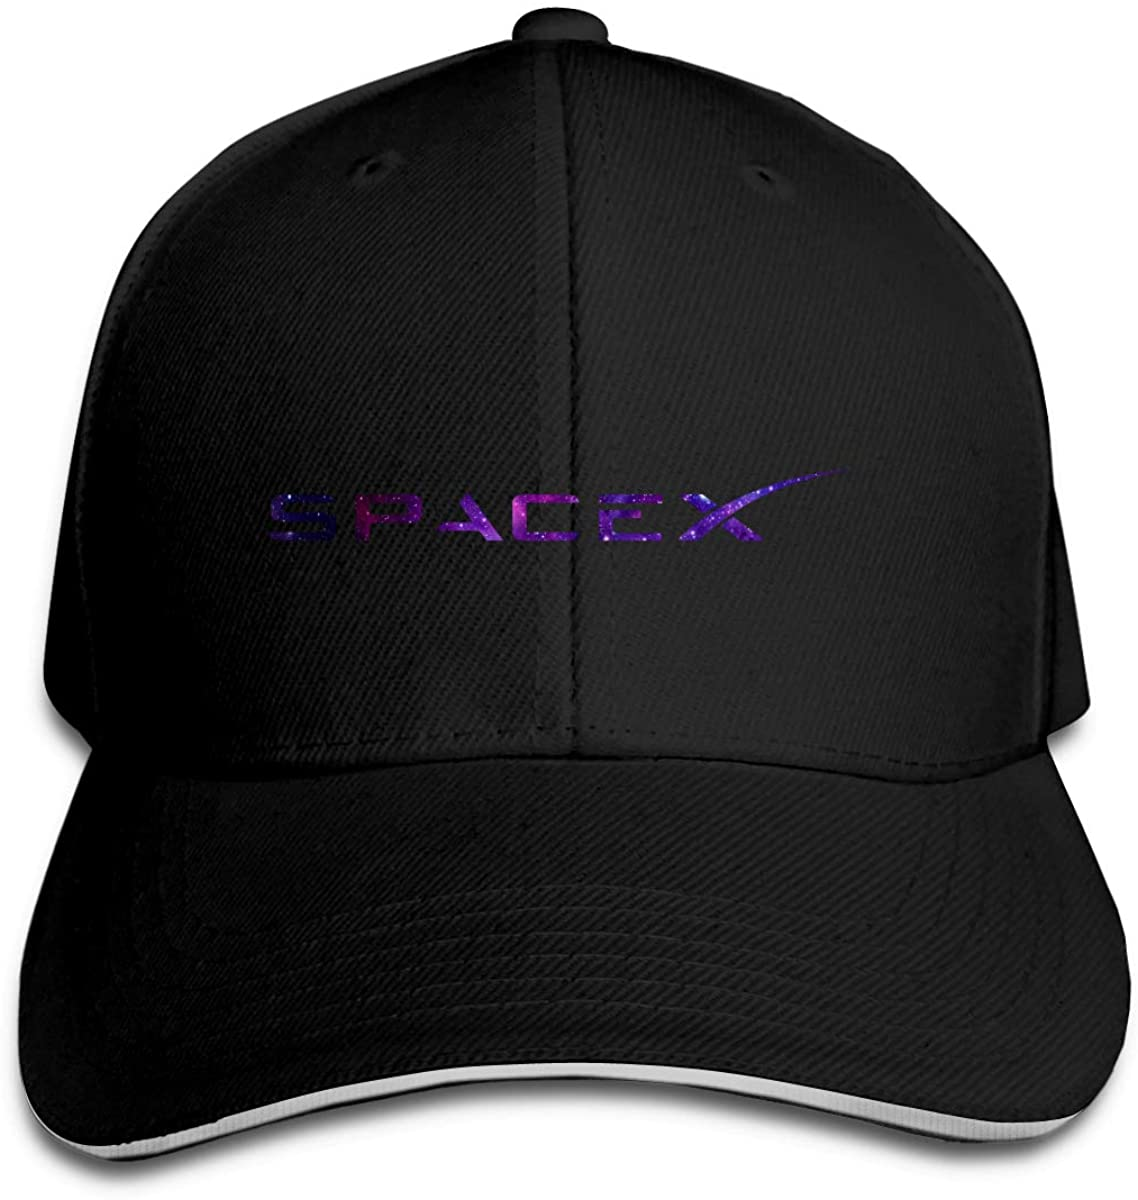 Lengyuye E SpaceX Unisex Adjustable Baseball Cap Hat Casquette